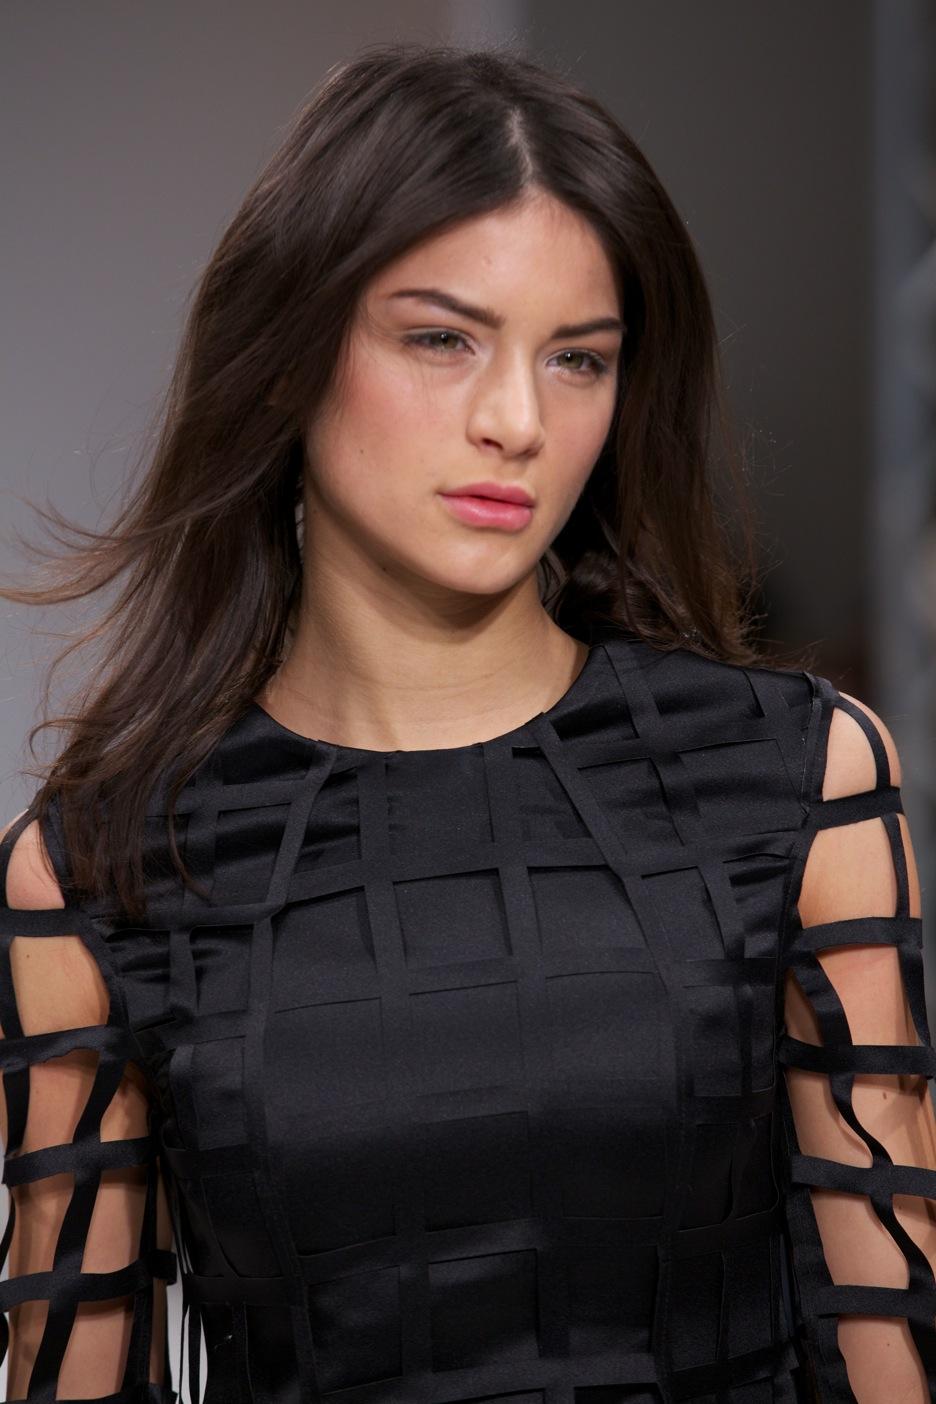 Kiev Fashion Days A-W 2014 (c) Marc aitken 2014  33.jpg